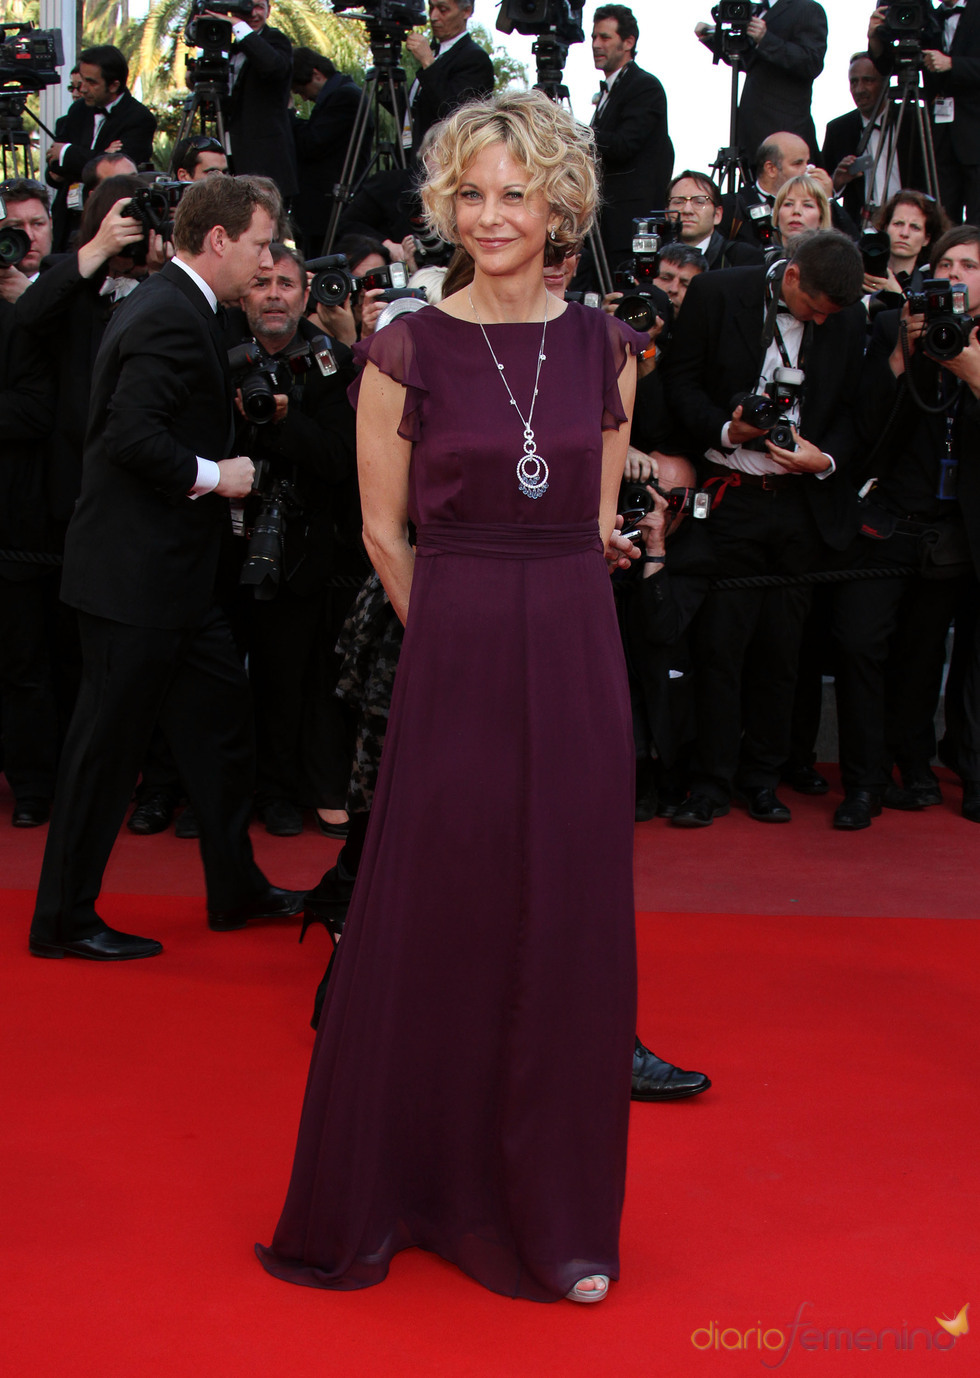 Meg Ryan, de granate en Cannes